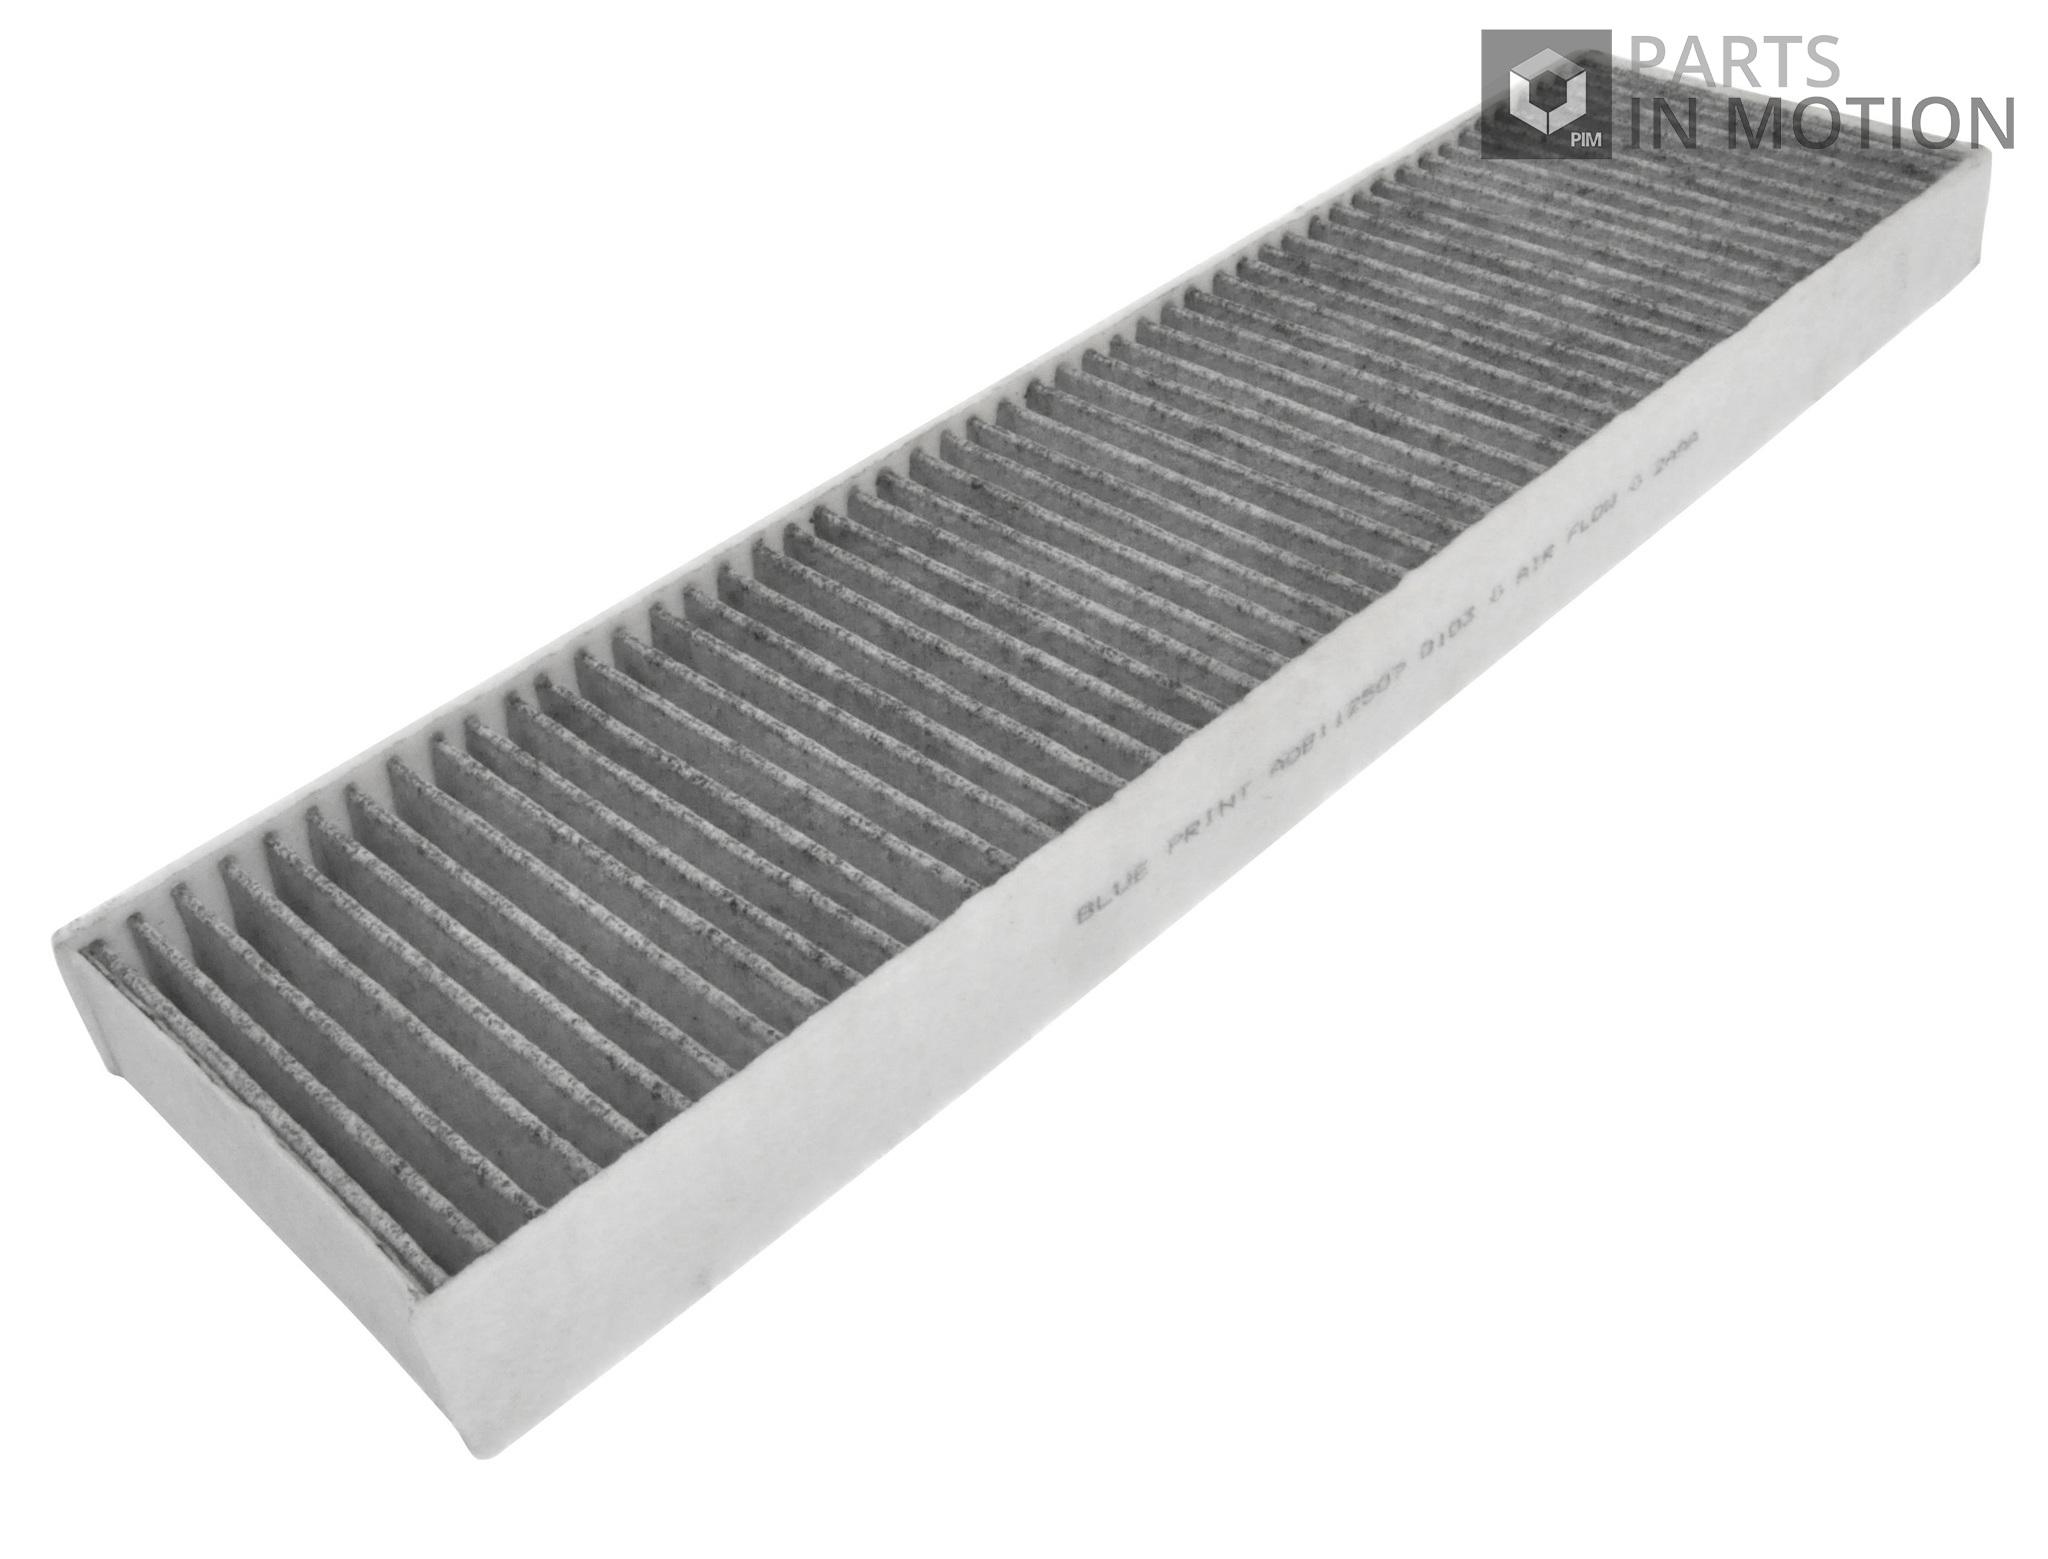 Ufi interior filtro Filtro Filtro de polen mini 53.156.00